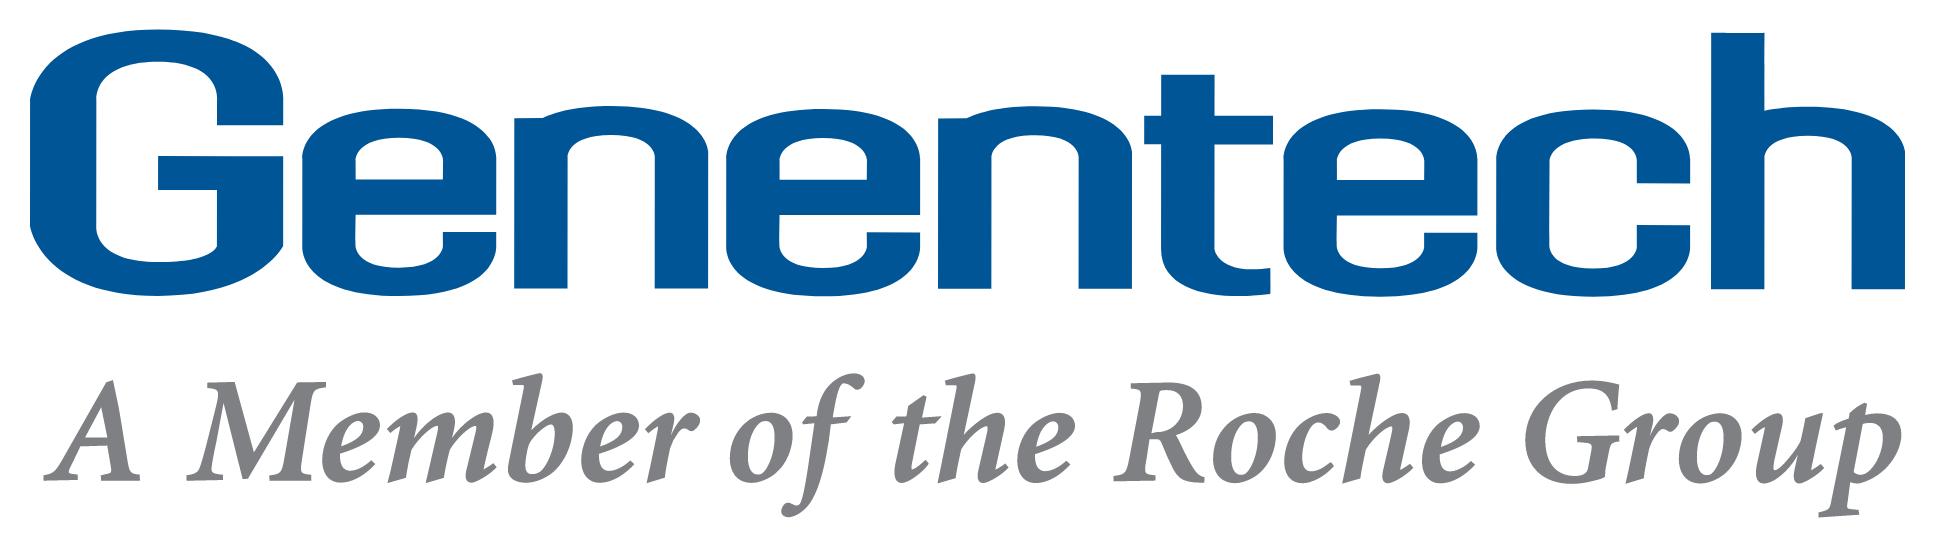 Breathe LA - Logo - Genentech - A Member of the Roche Group